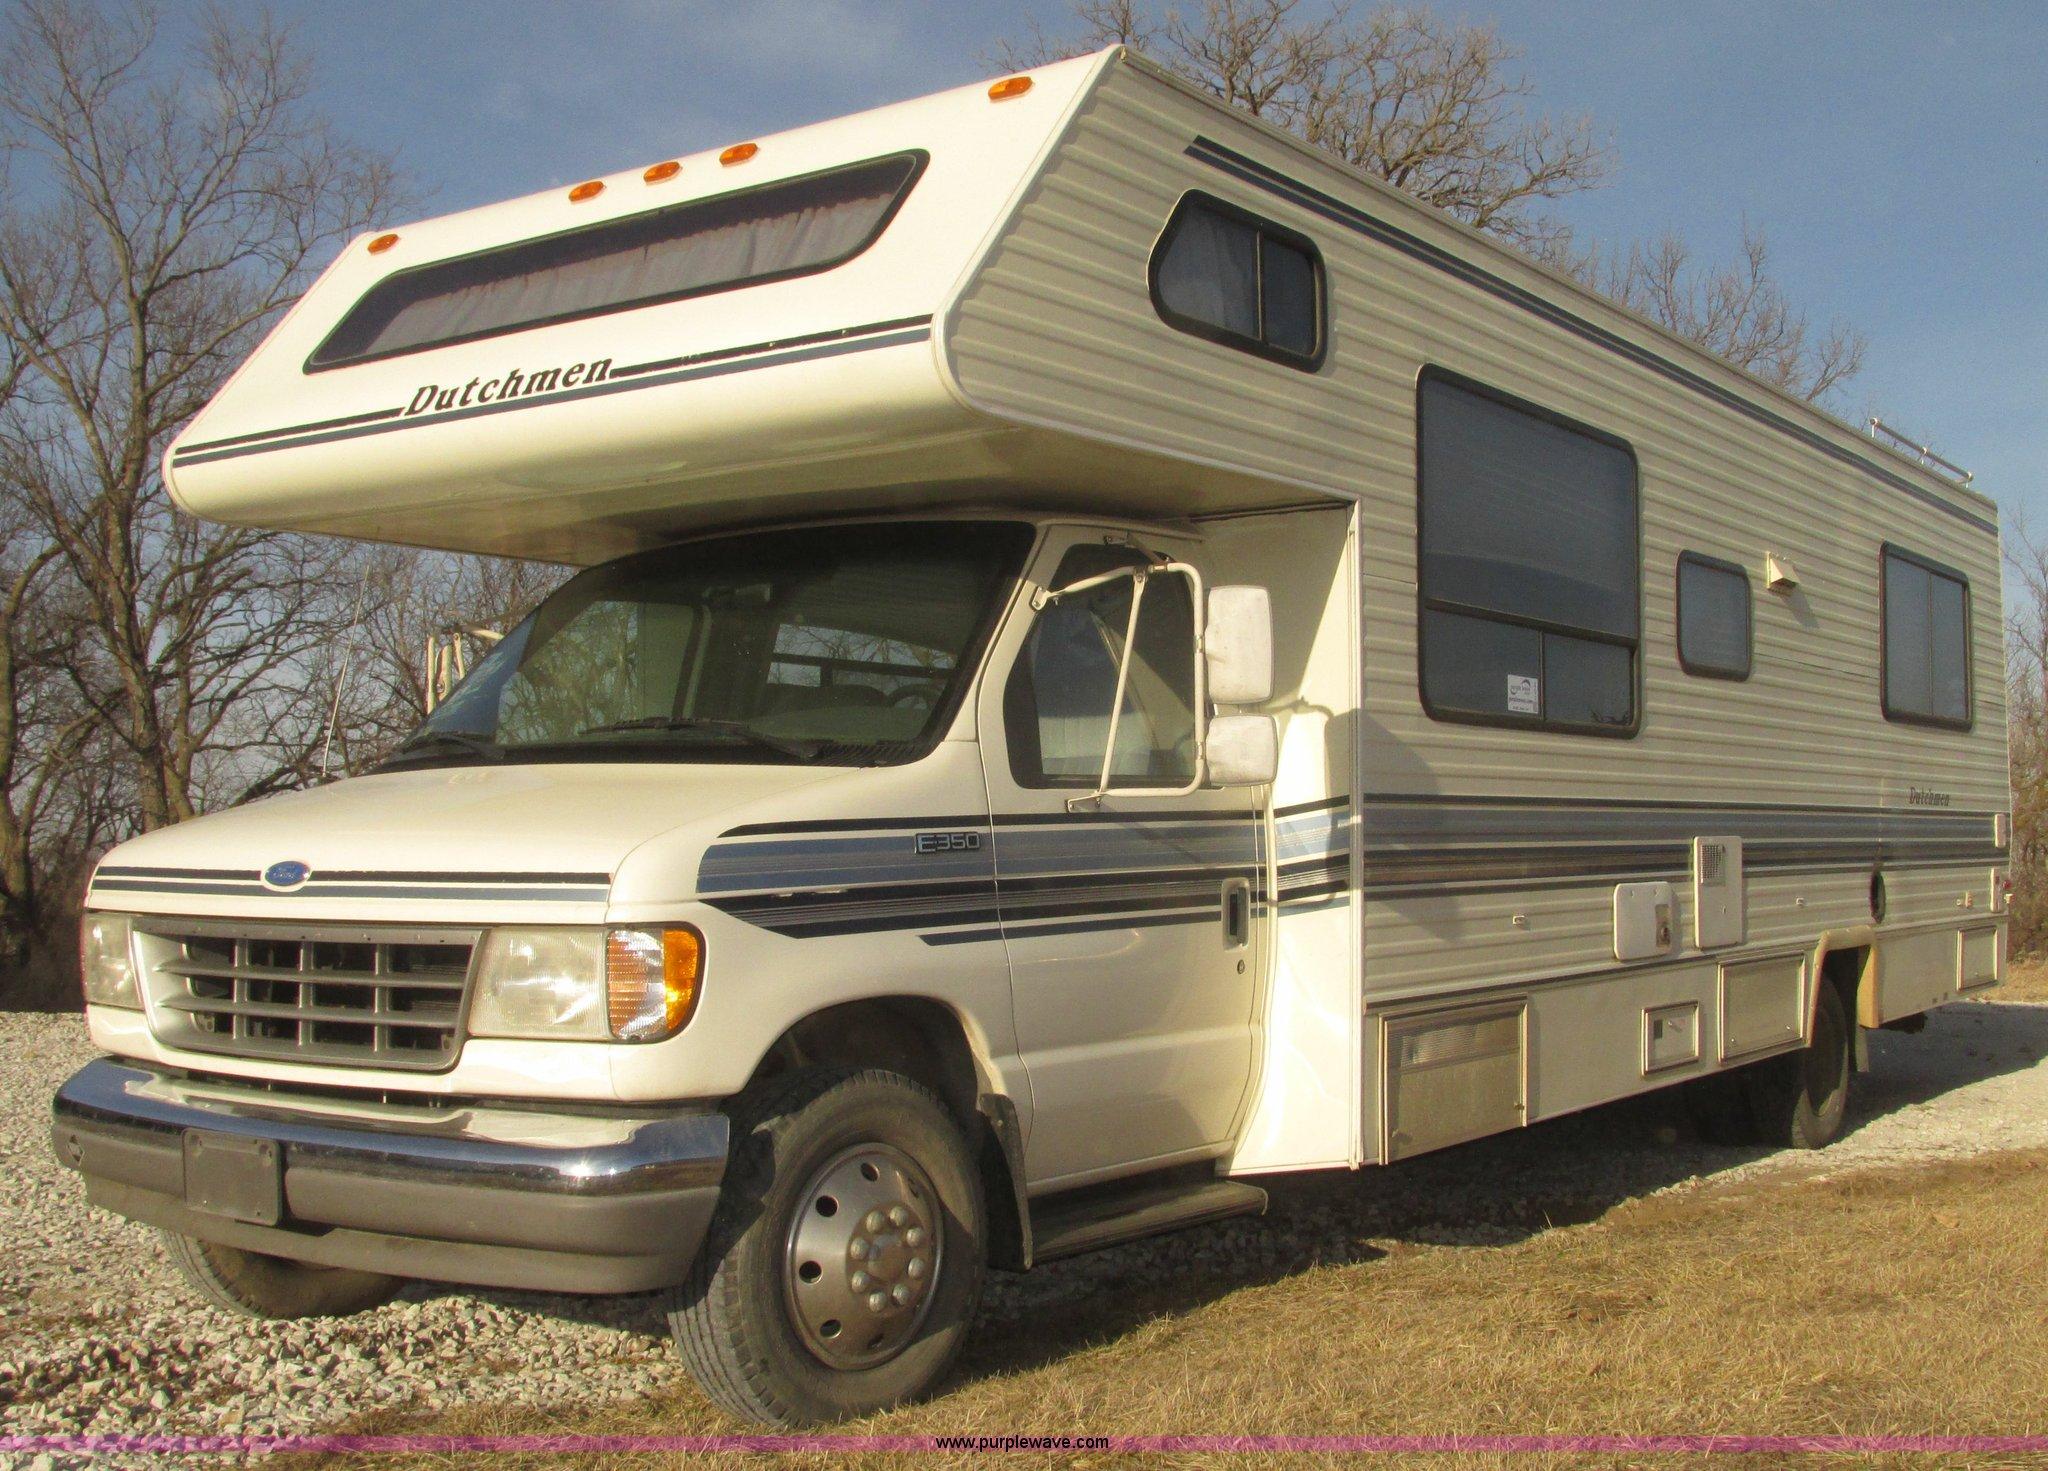 1993 ford econoline e350 dutchman 30 rv item h4735 sold rh purplewave com